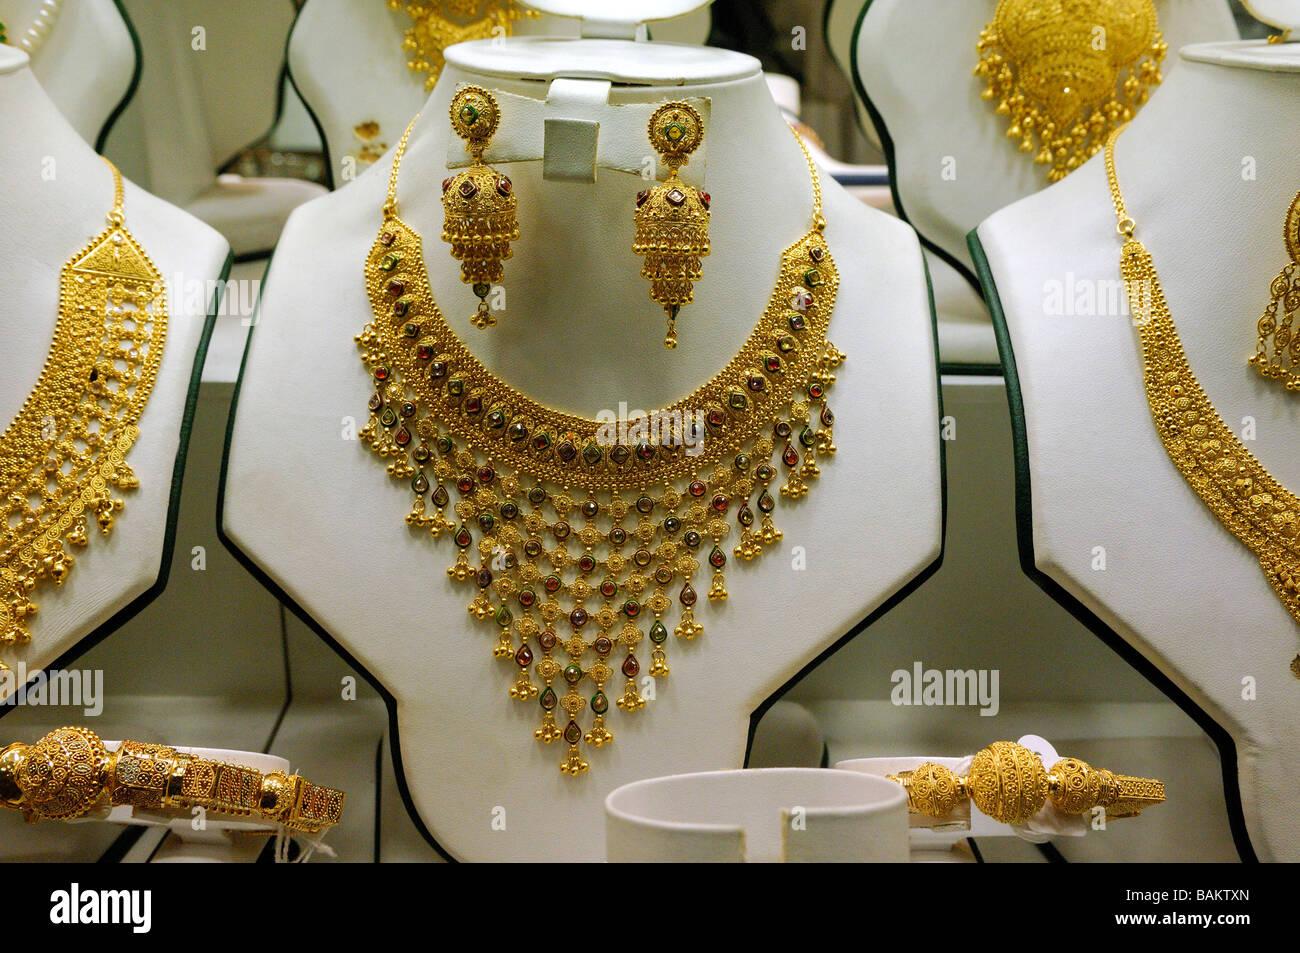 Dubai Souqs - Gold - Stock Image